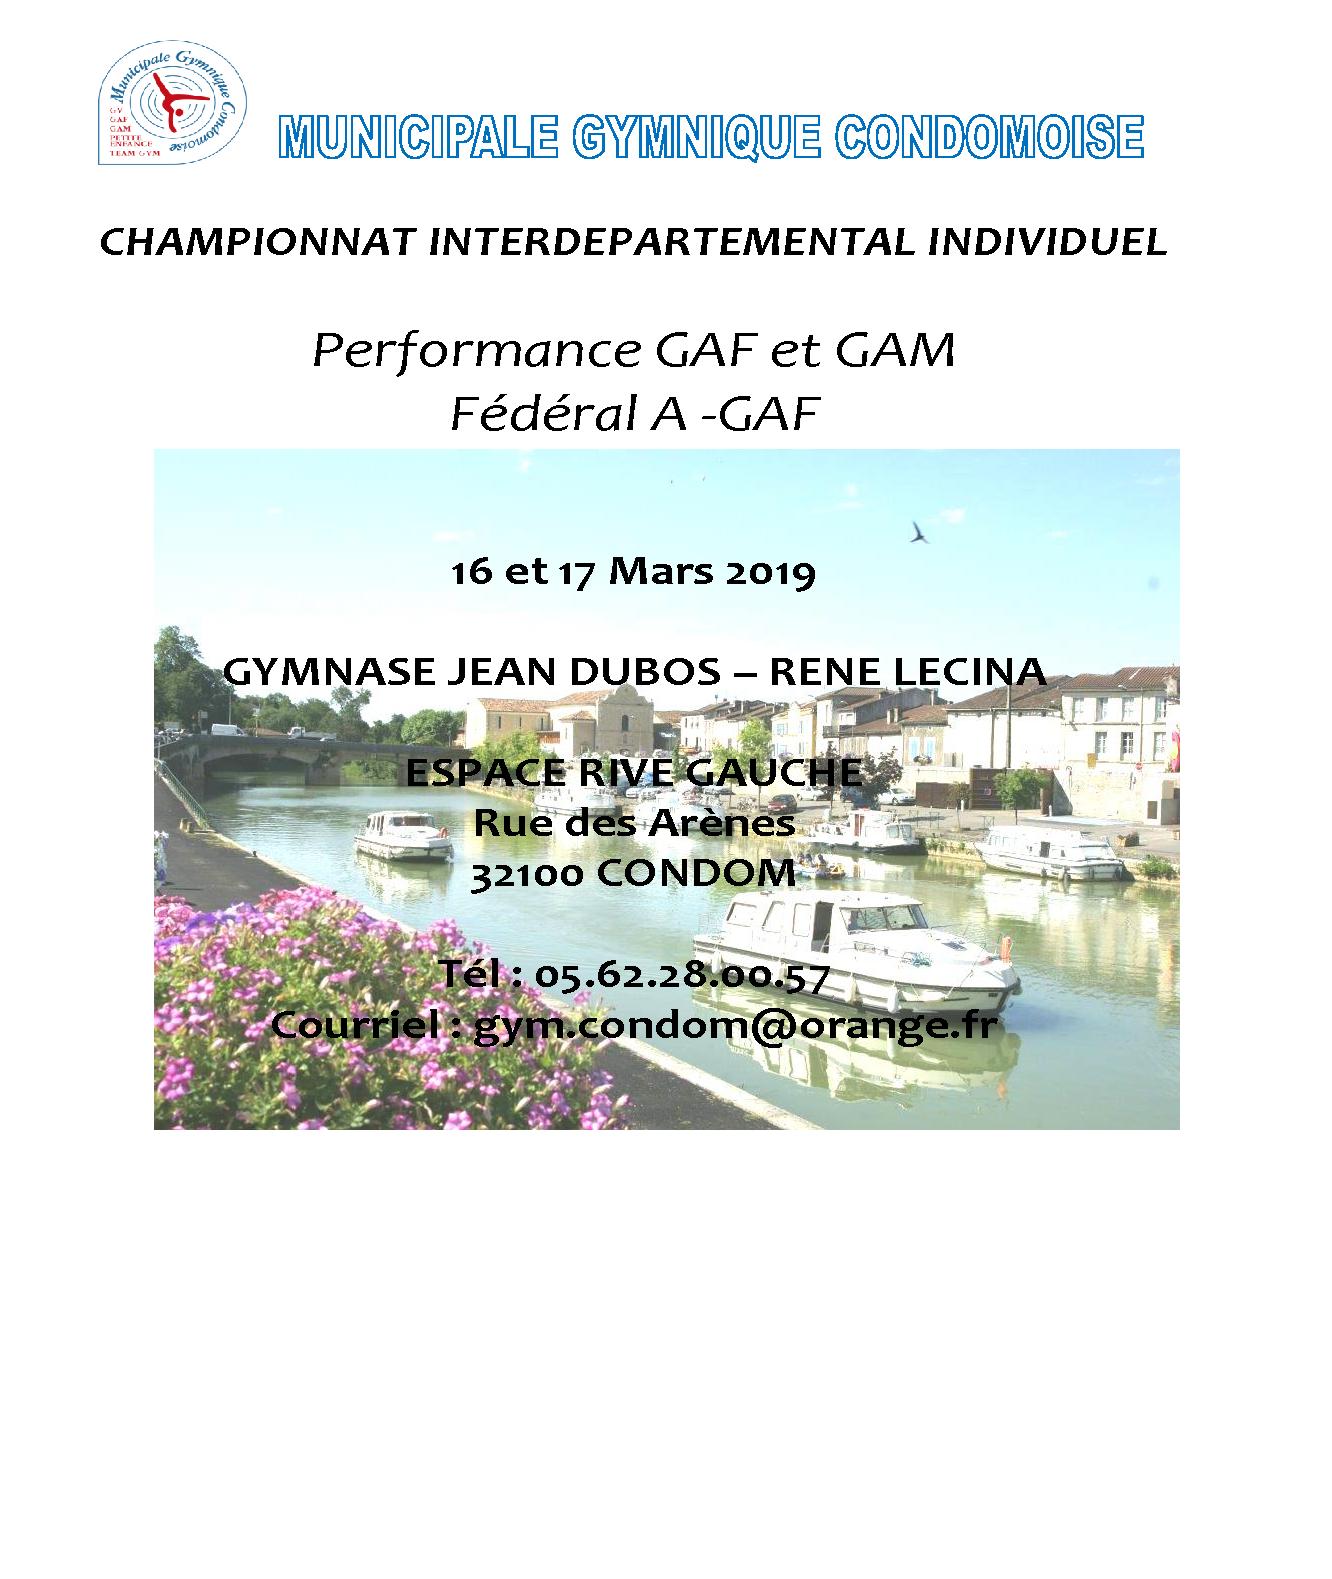 CHAMPIONNAT INTERDEPARTEMENTAL INDIVIDUEL  GAM Performance et Fédéral CONDOM